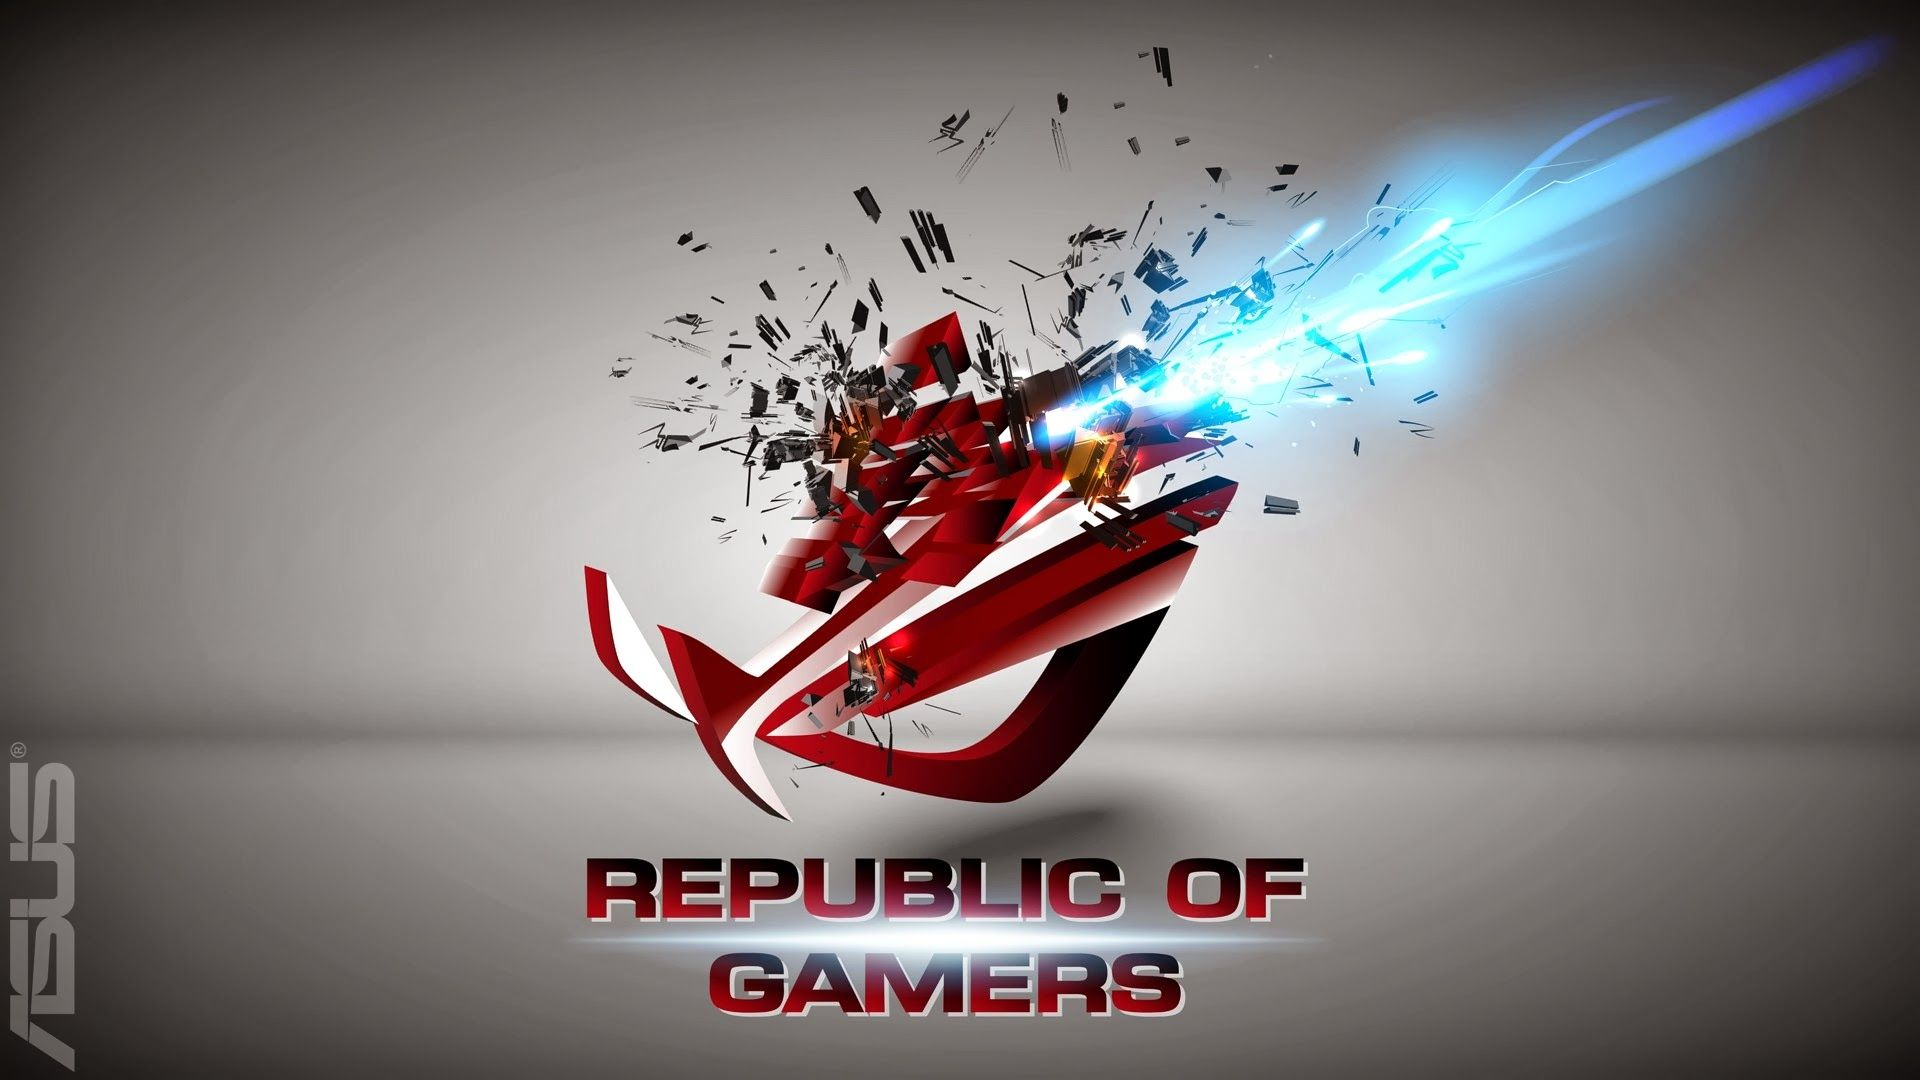 Cool Asus RoG Republic of Gamers HD Wallpaper | tábla